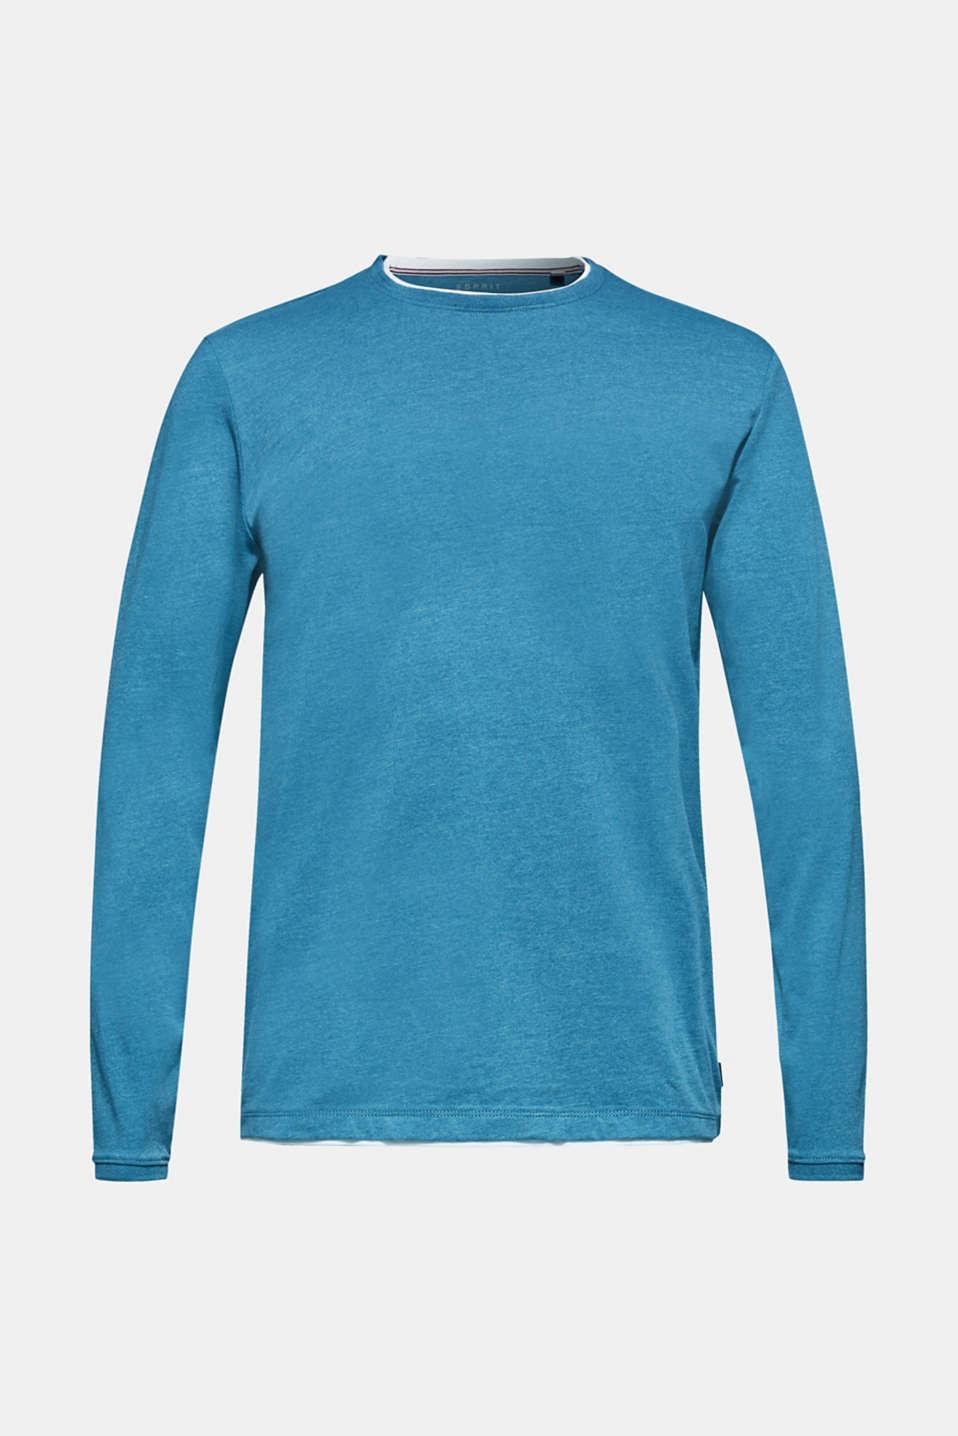 T-Shirts, PETROL BLUE, detail image number 7